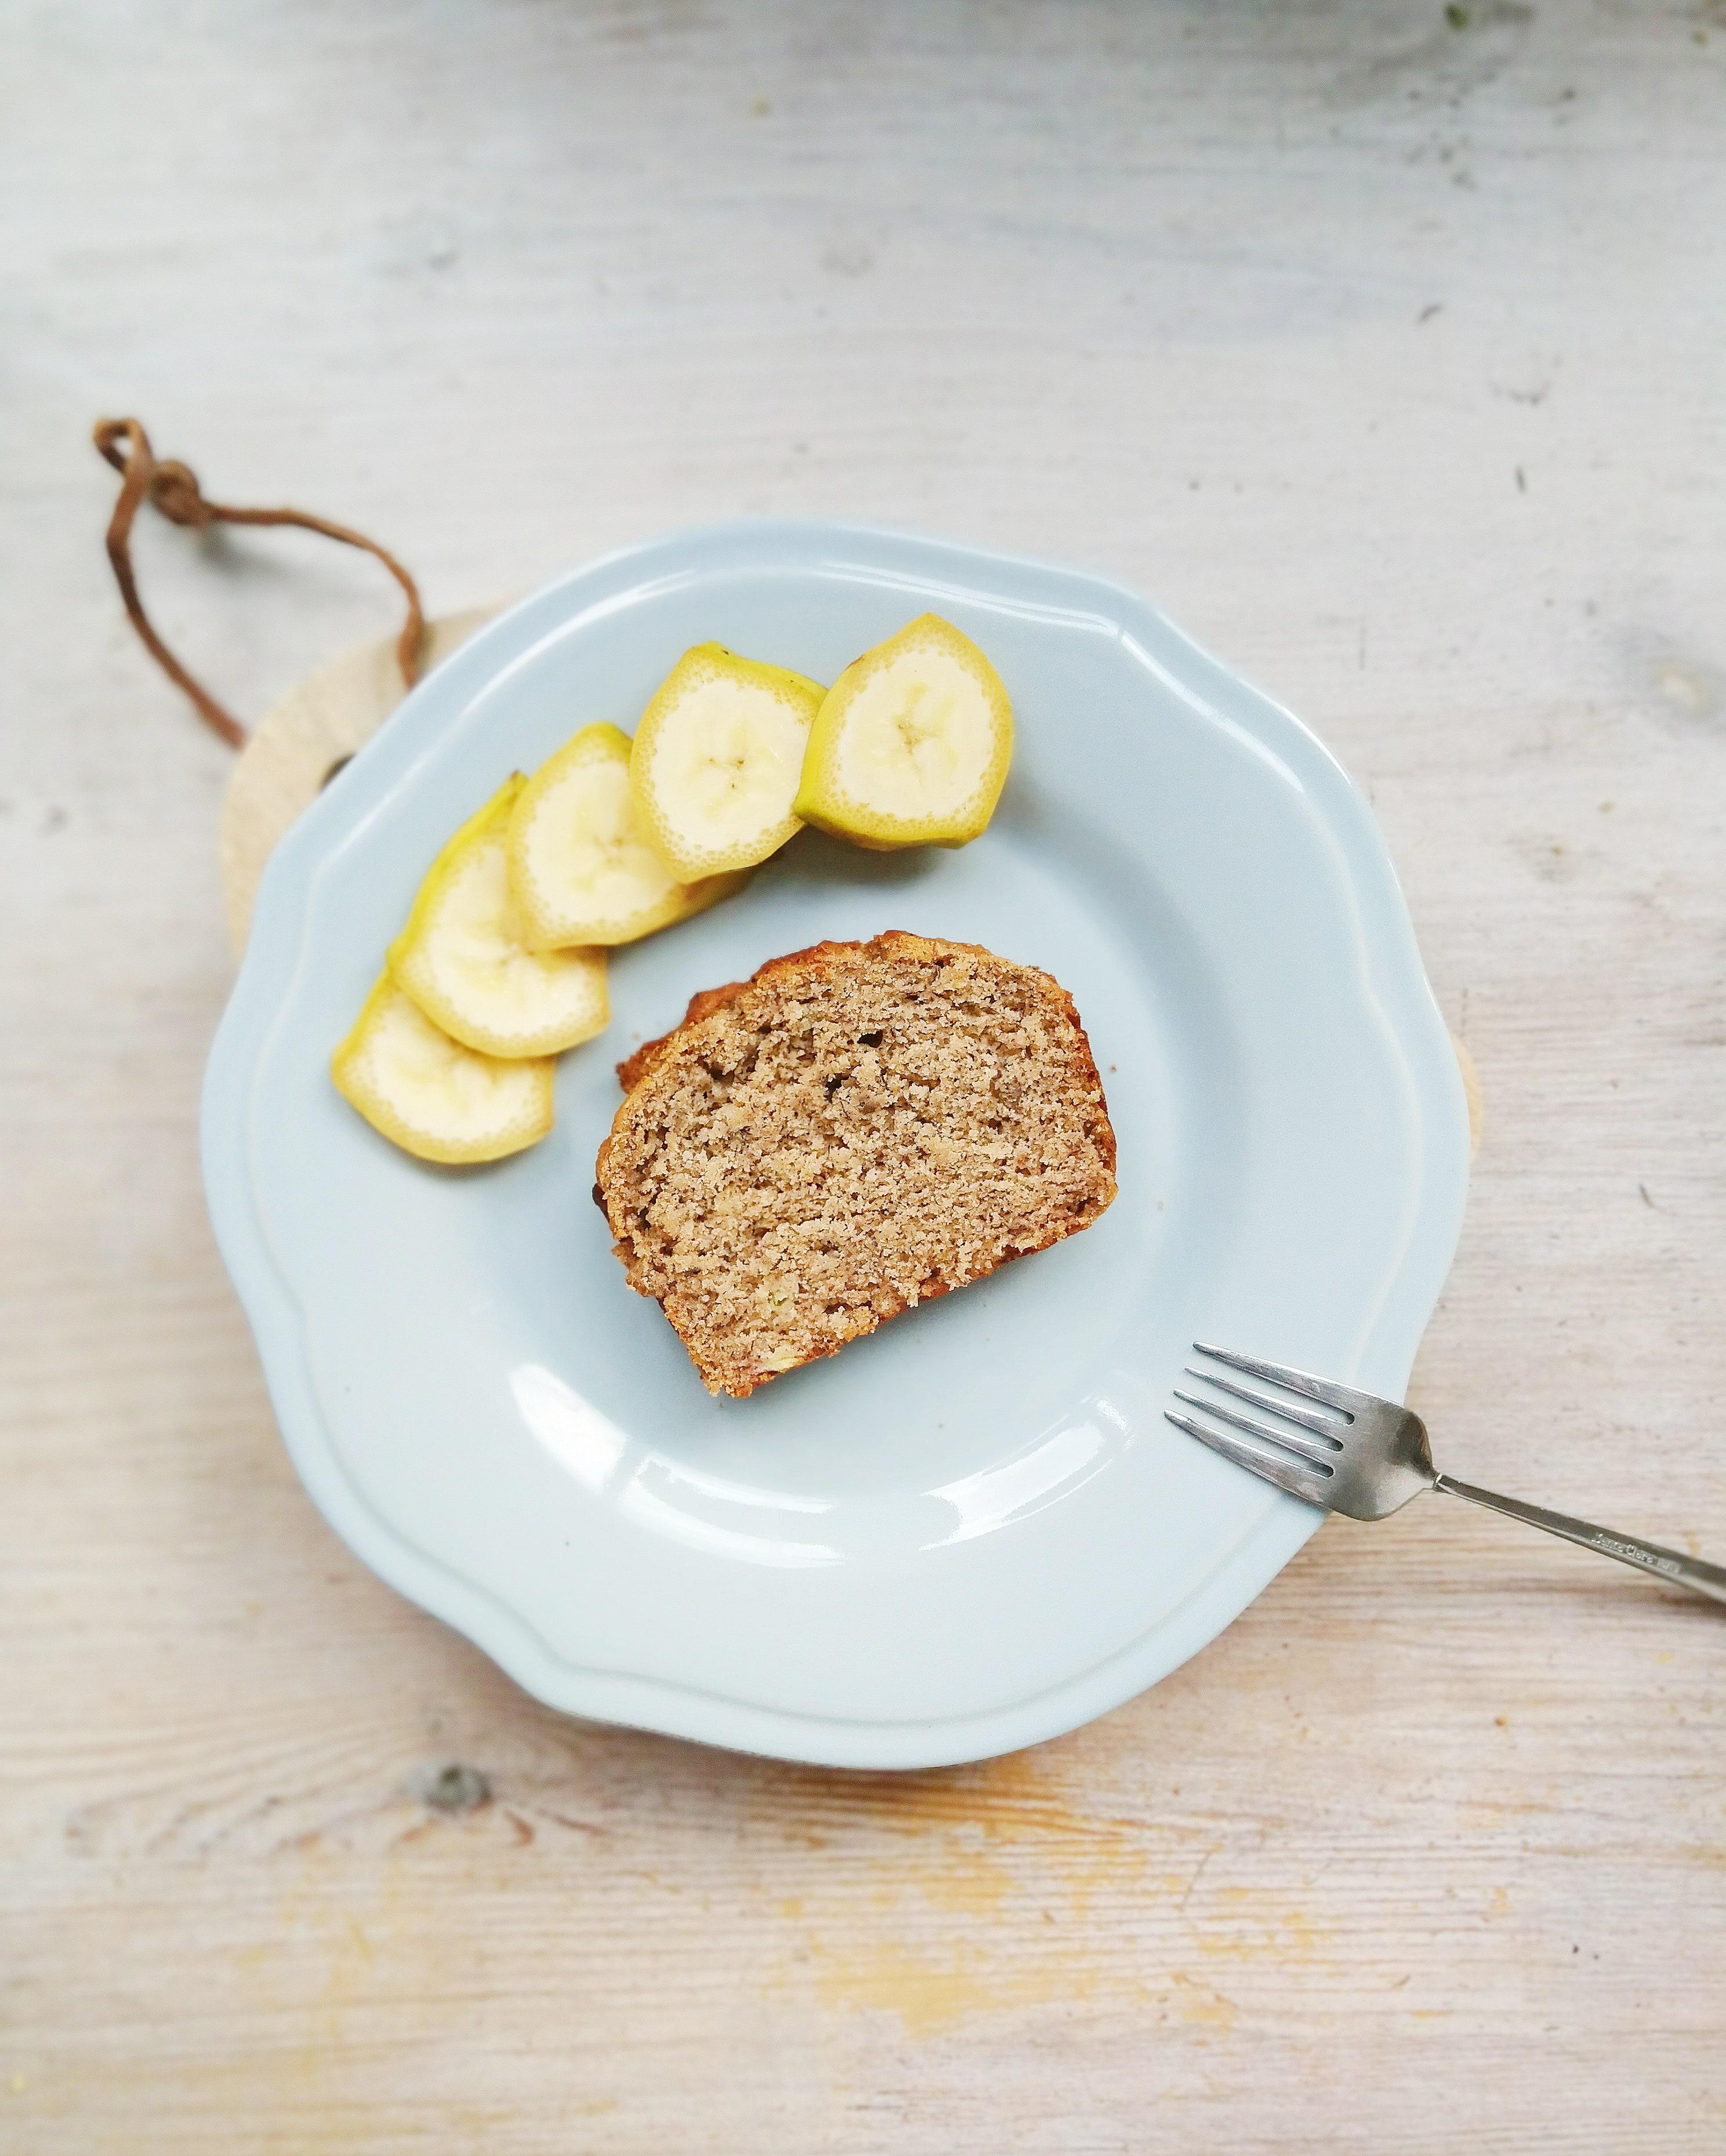 Banana bread en plato